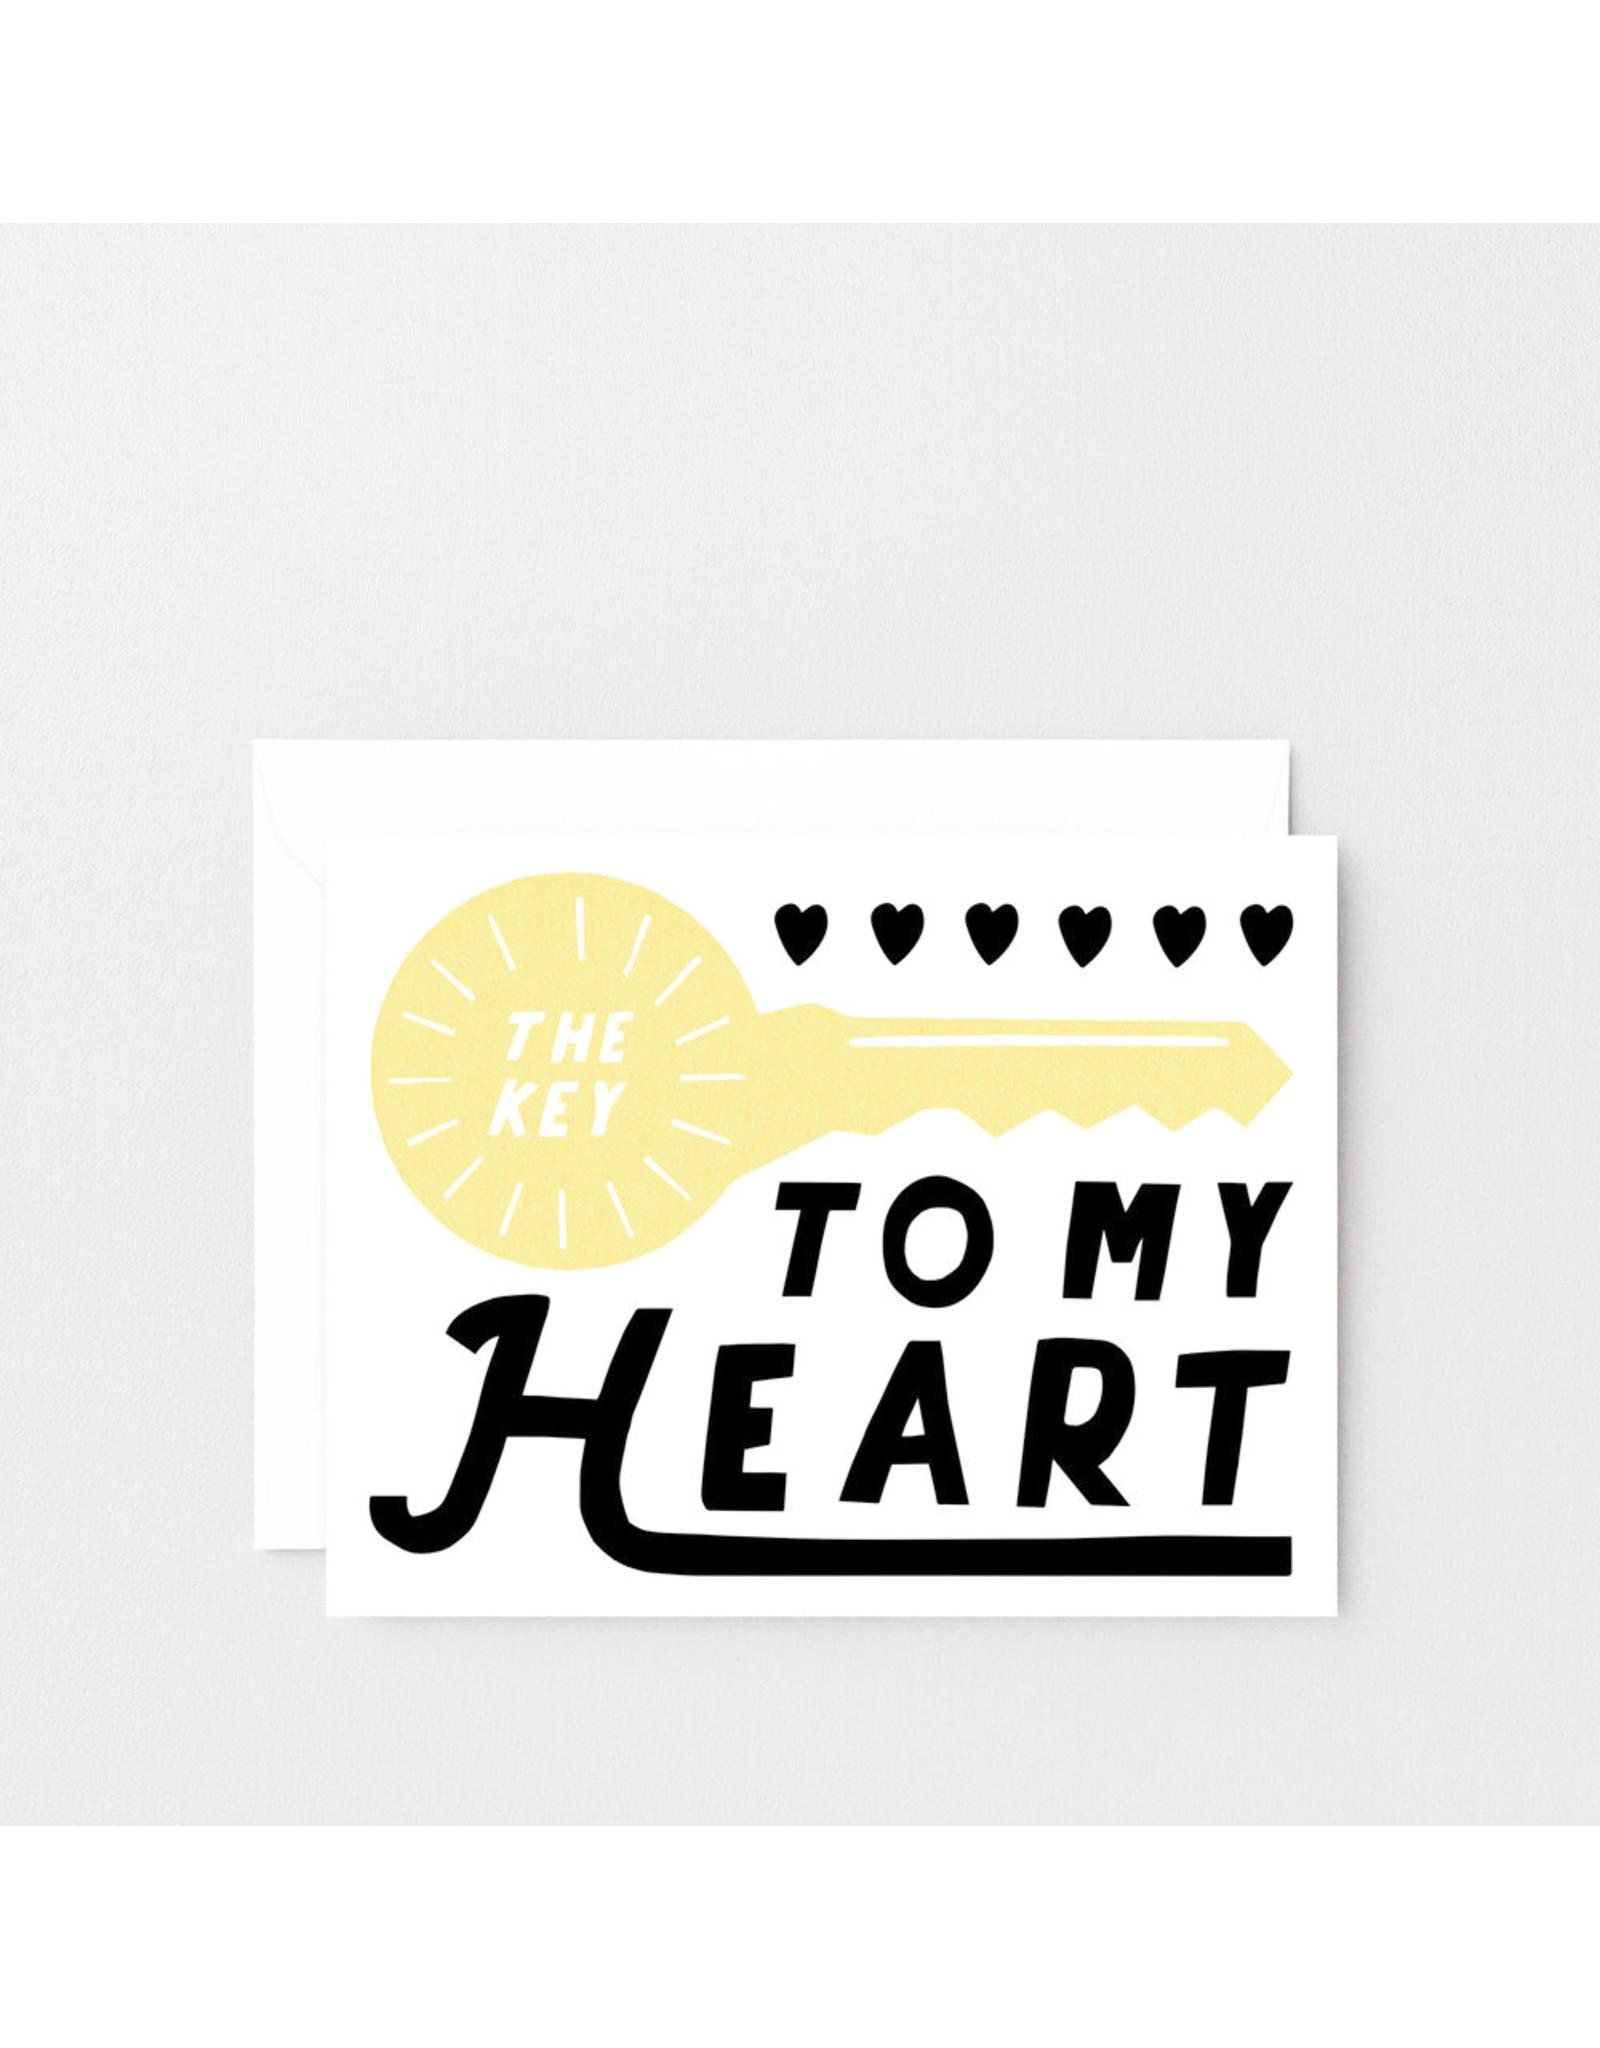 Wrap Card Key to My Heart